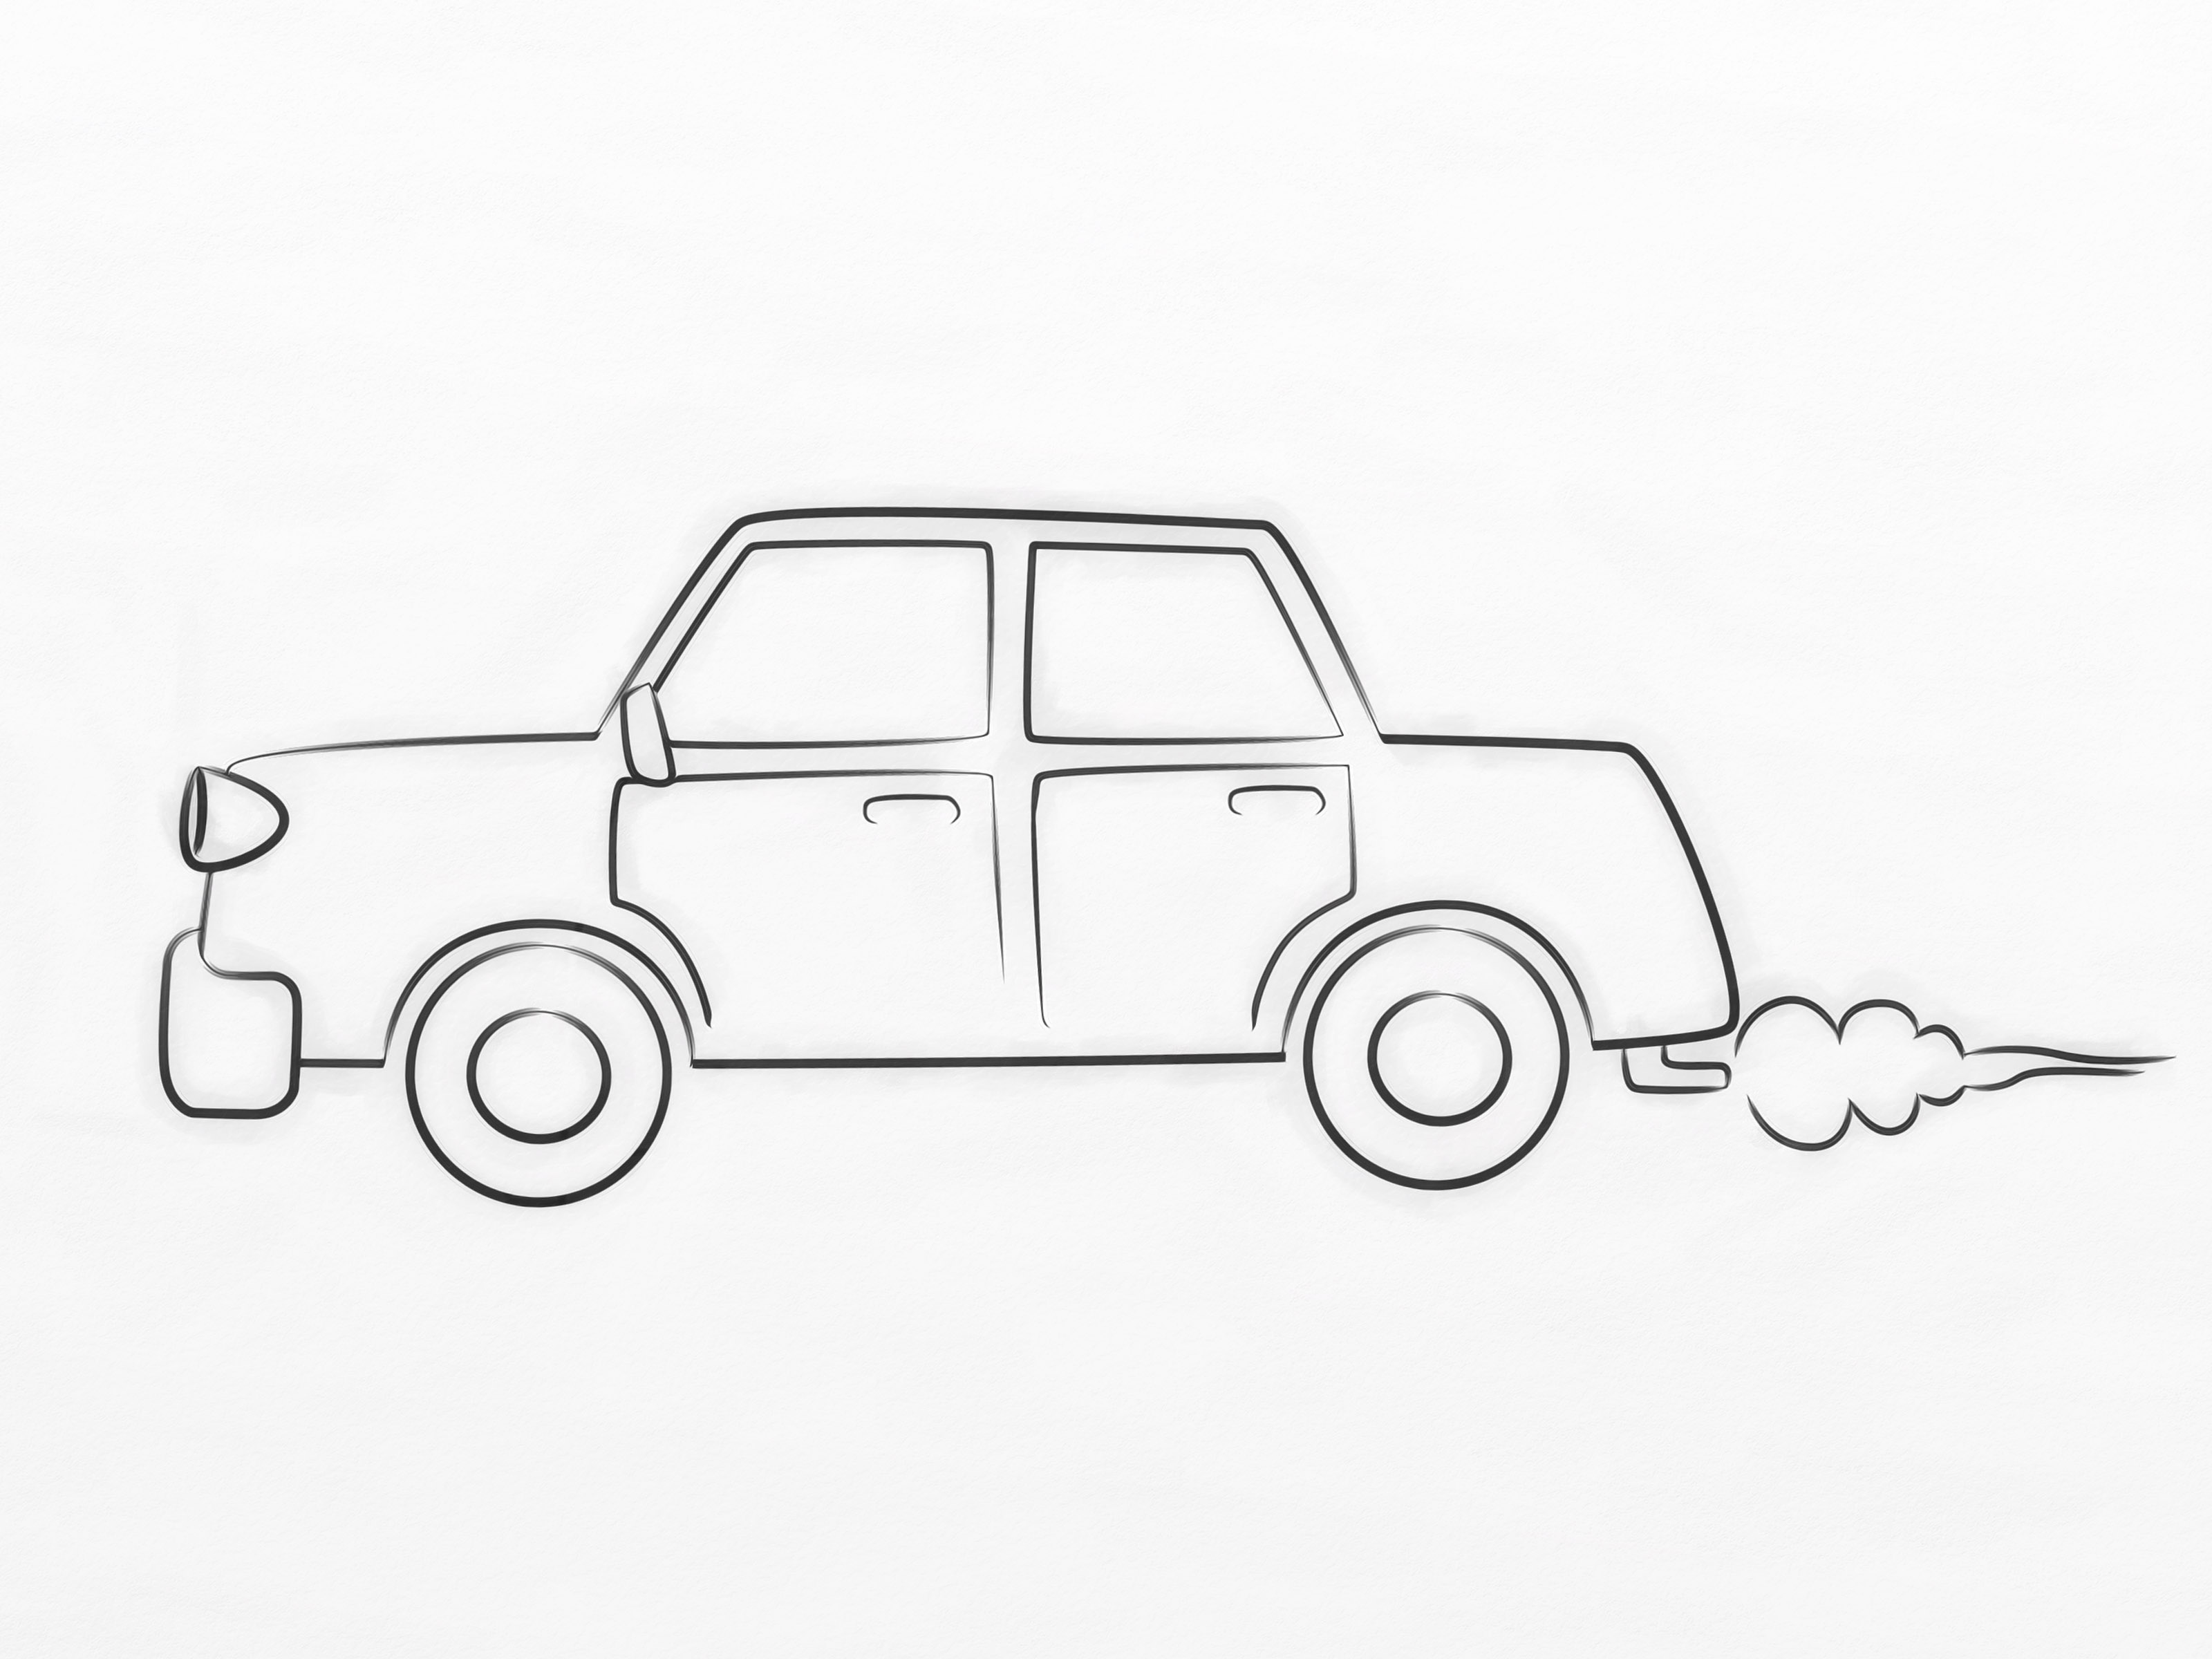 Back Of Car Drawing At Getdrawings